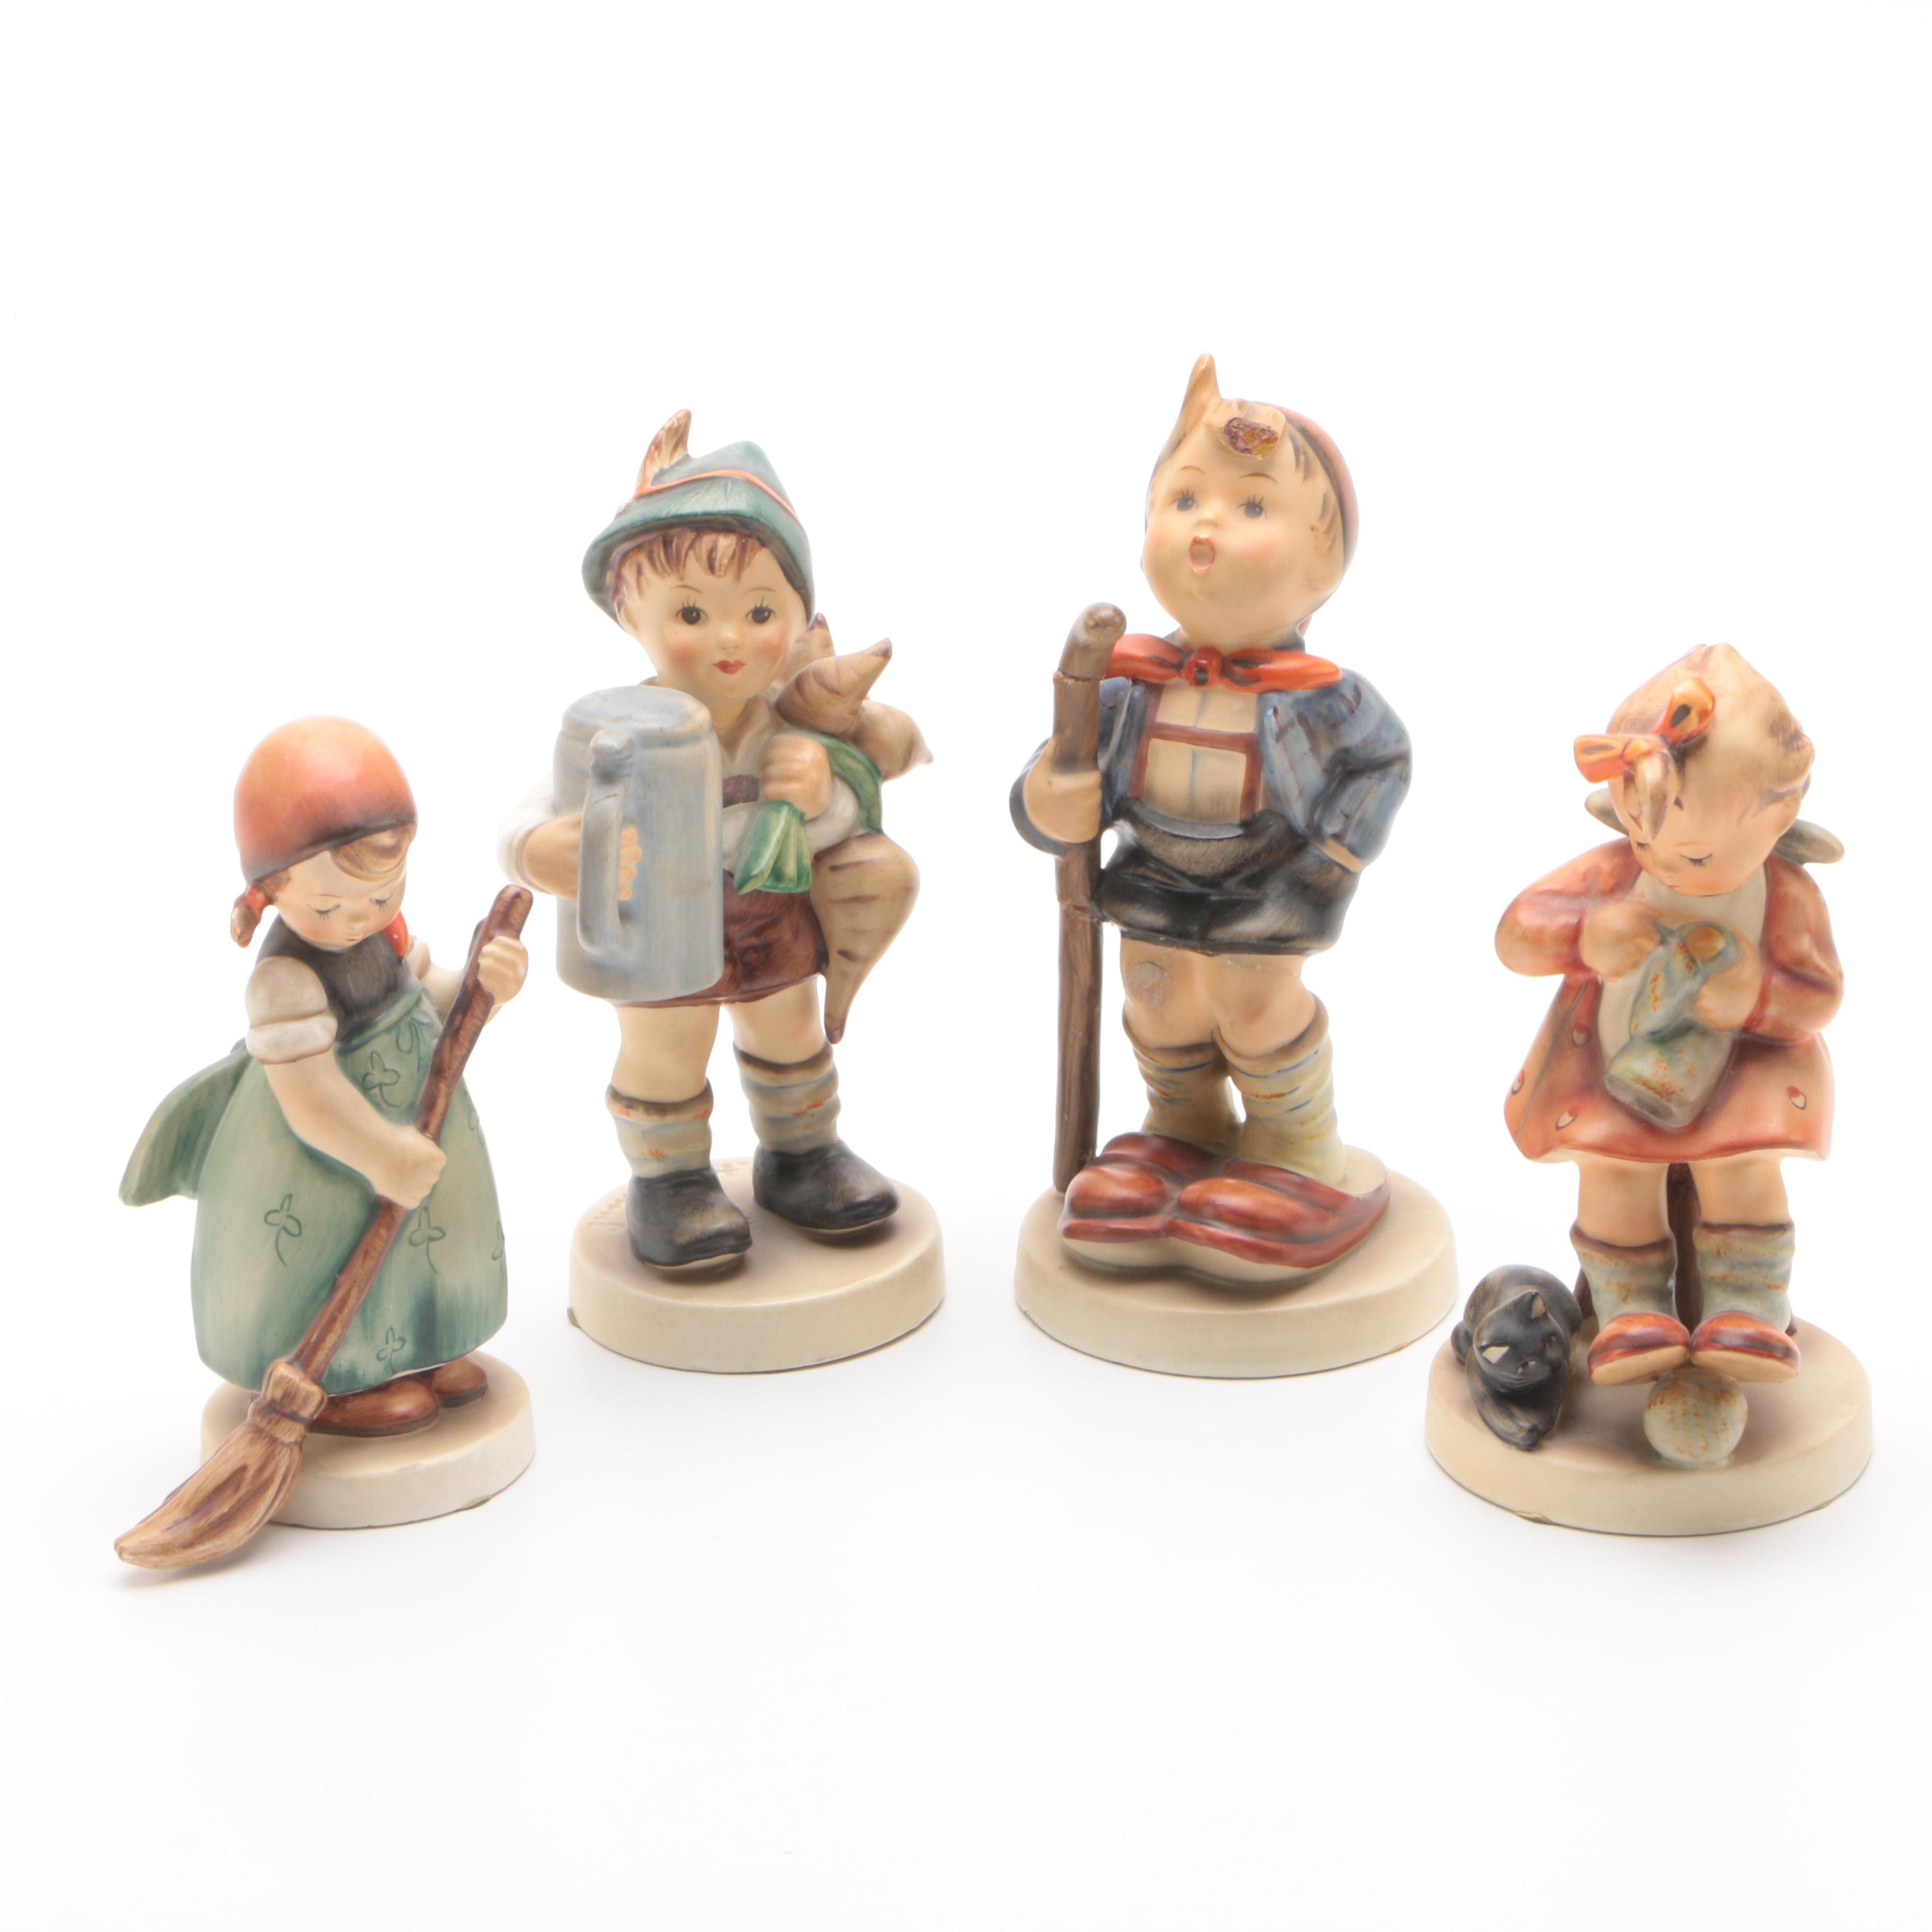 "Goebel M.I. Hummel ""For Father"" and Other Porcelain Figurines"